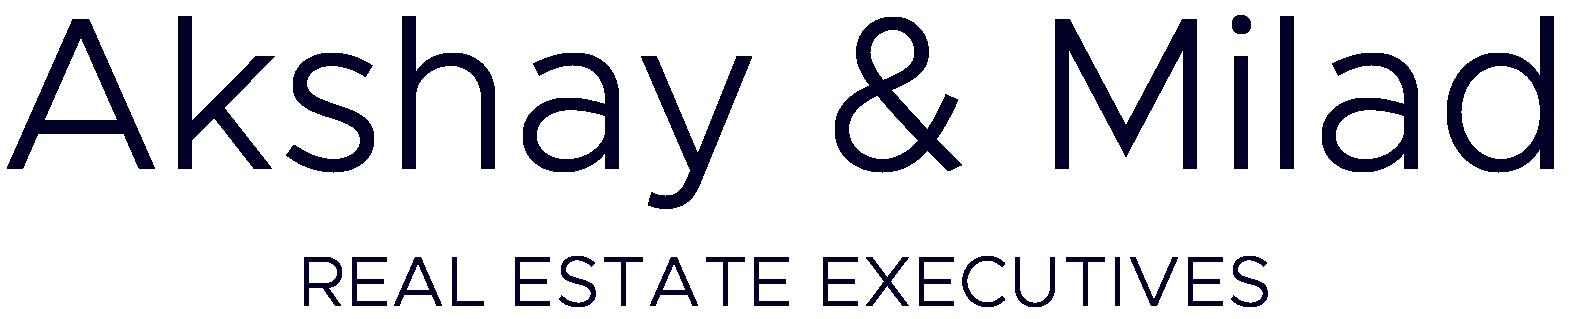 Akshay & Milad Real Estate Executives